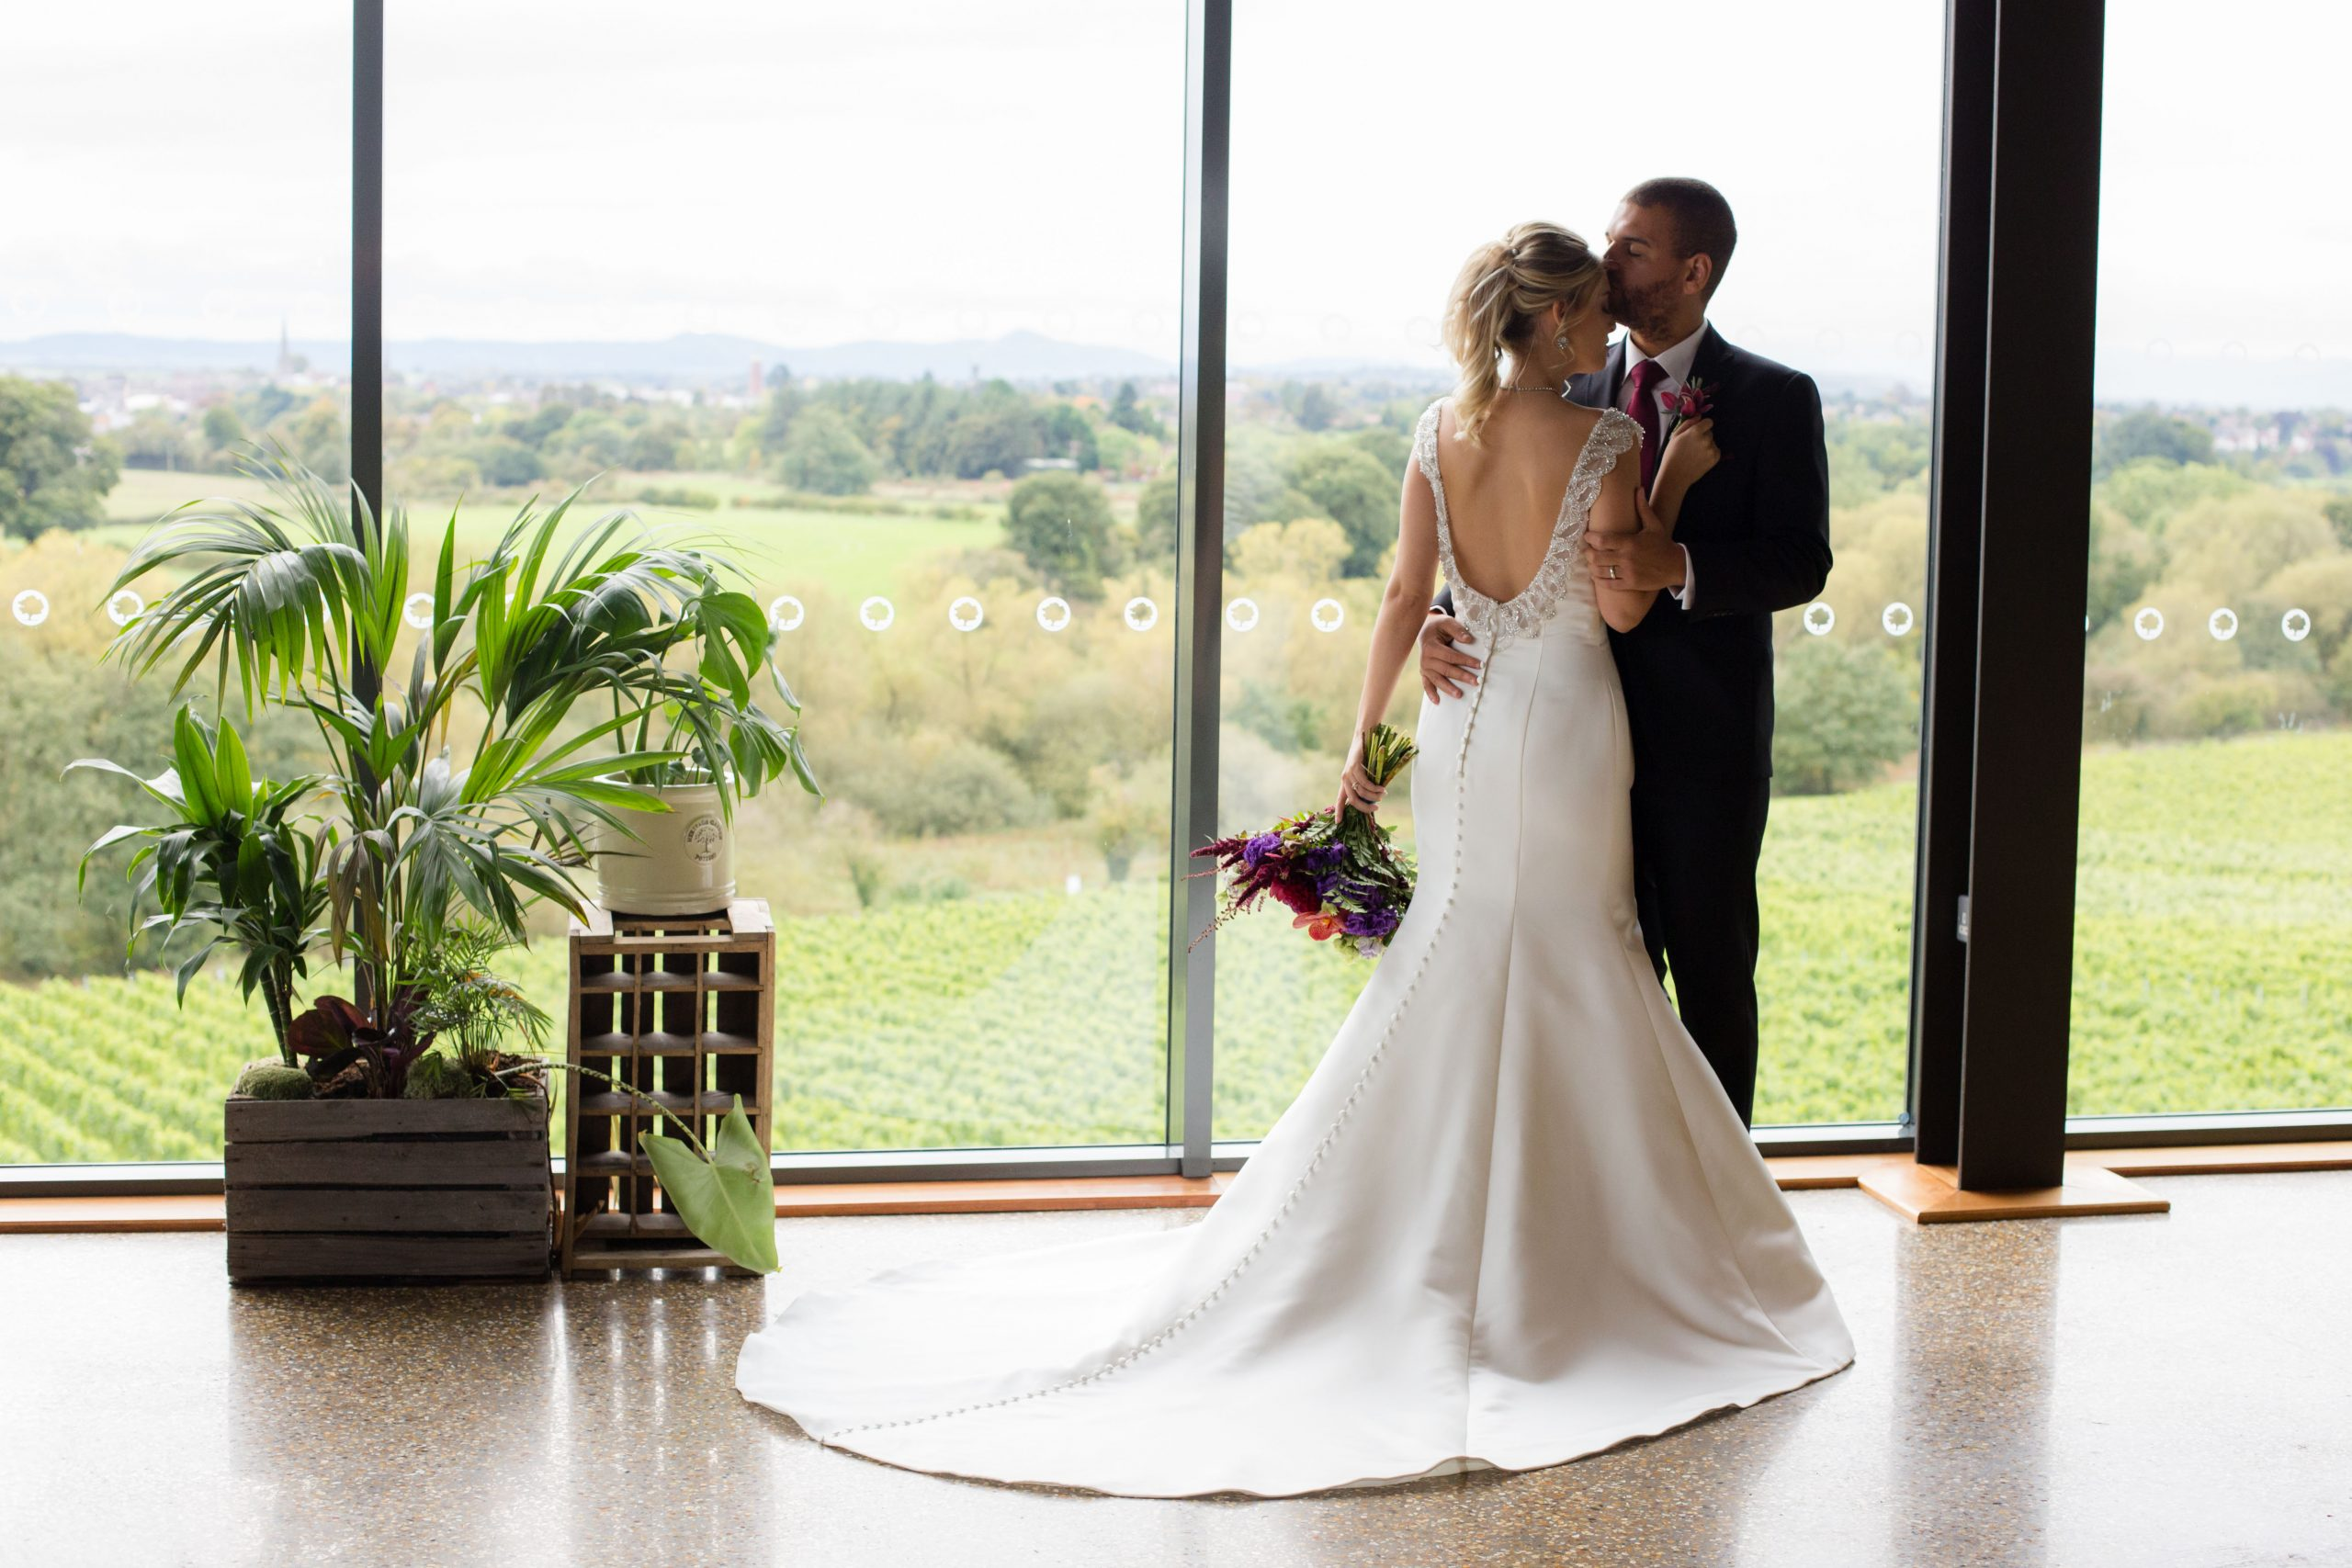 Shropshire elopement photography at Hencote Vineyard estate